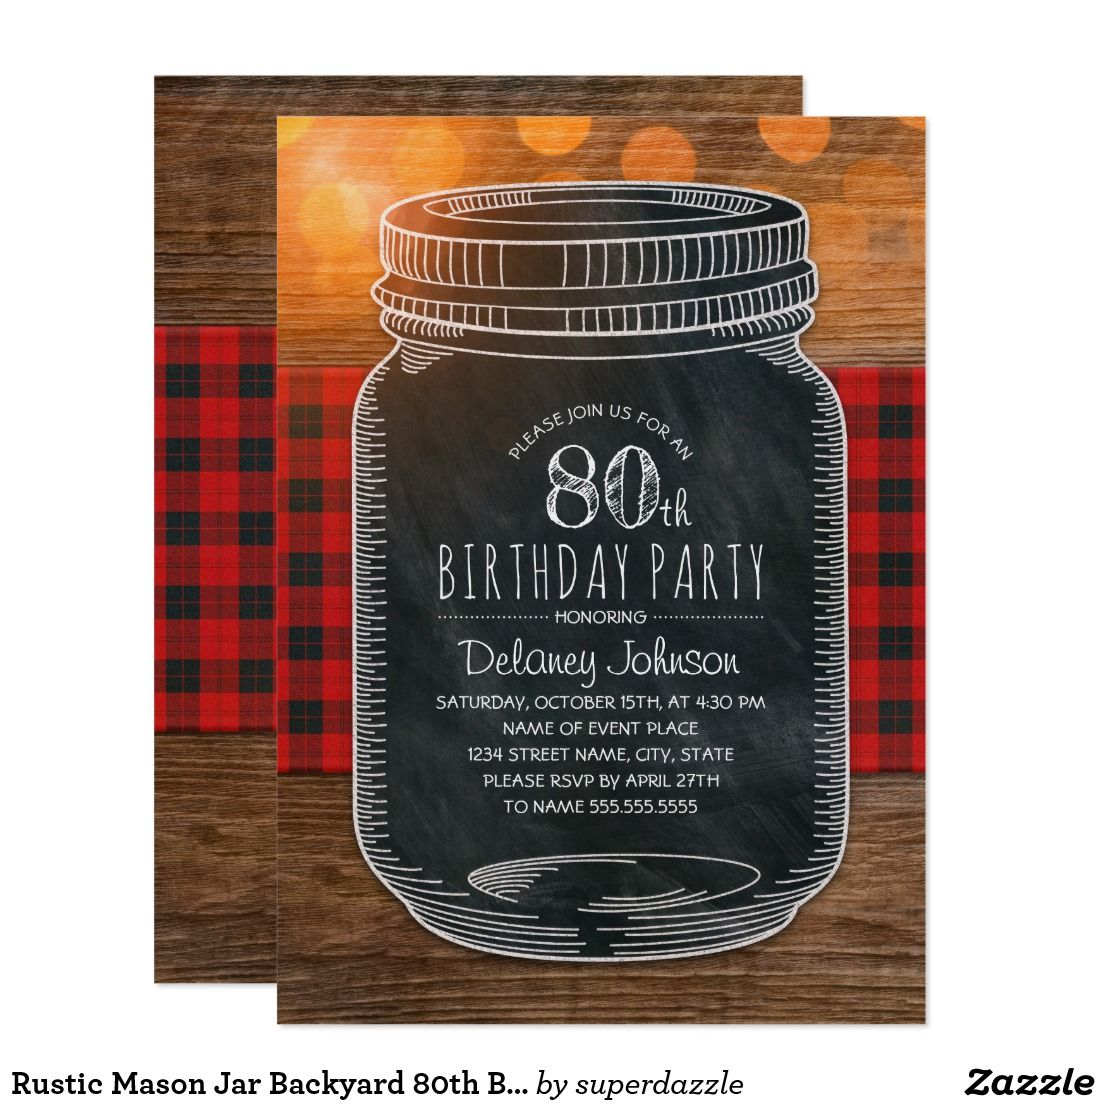 Rustic Mason Jar Backyard 80th Birthday Party Invitation ...